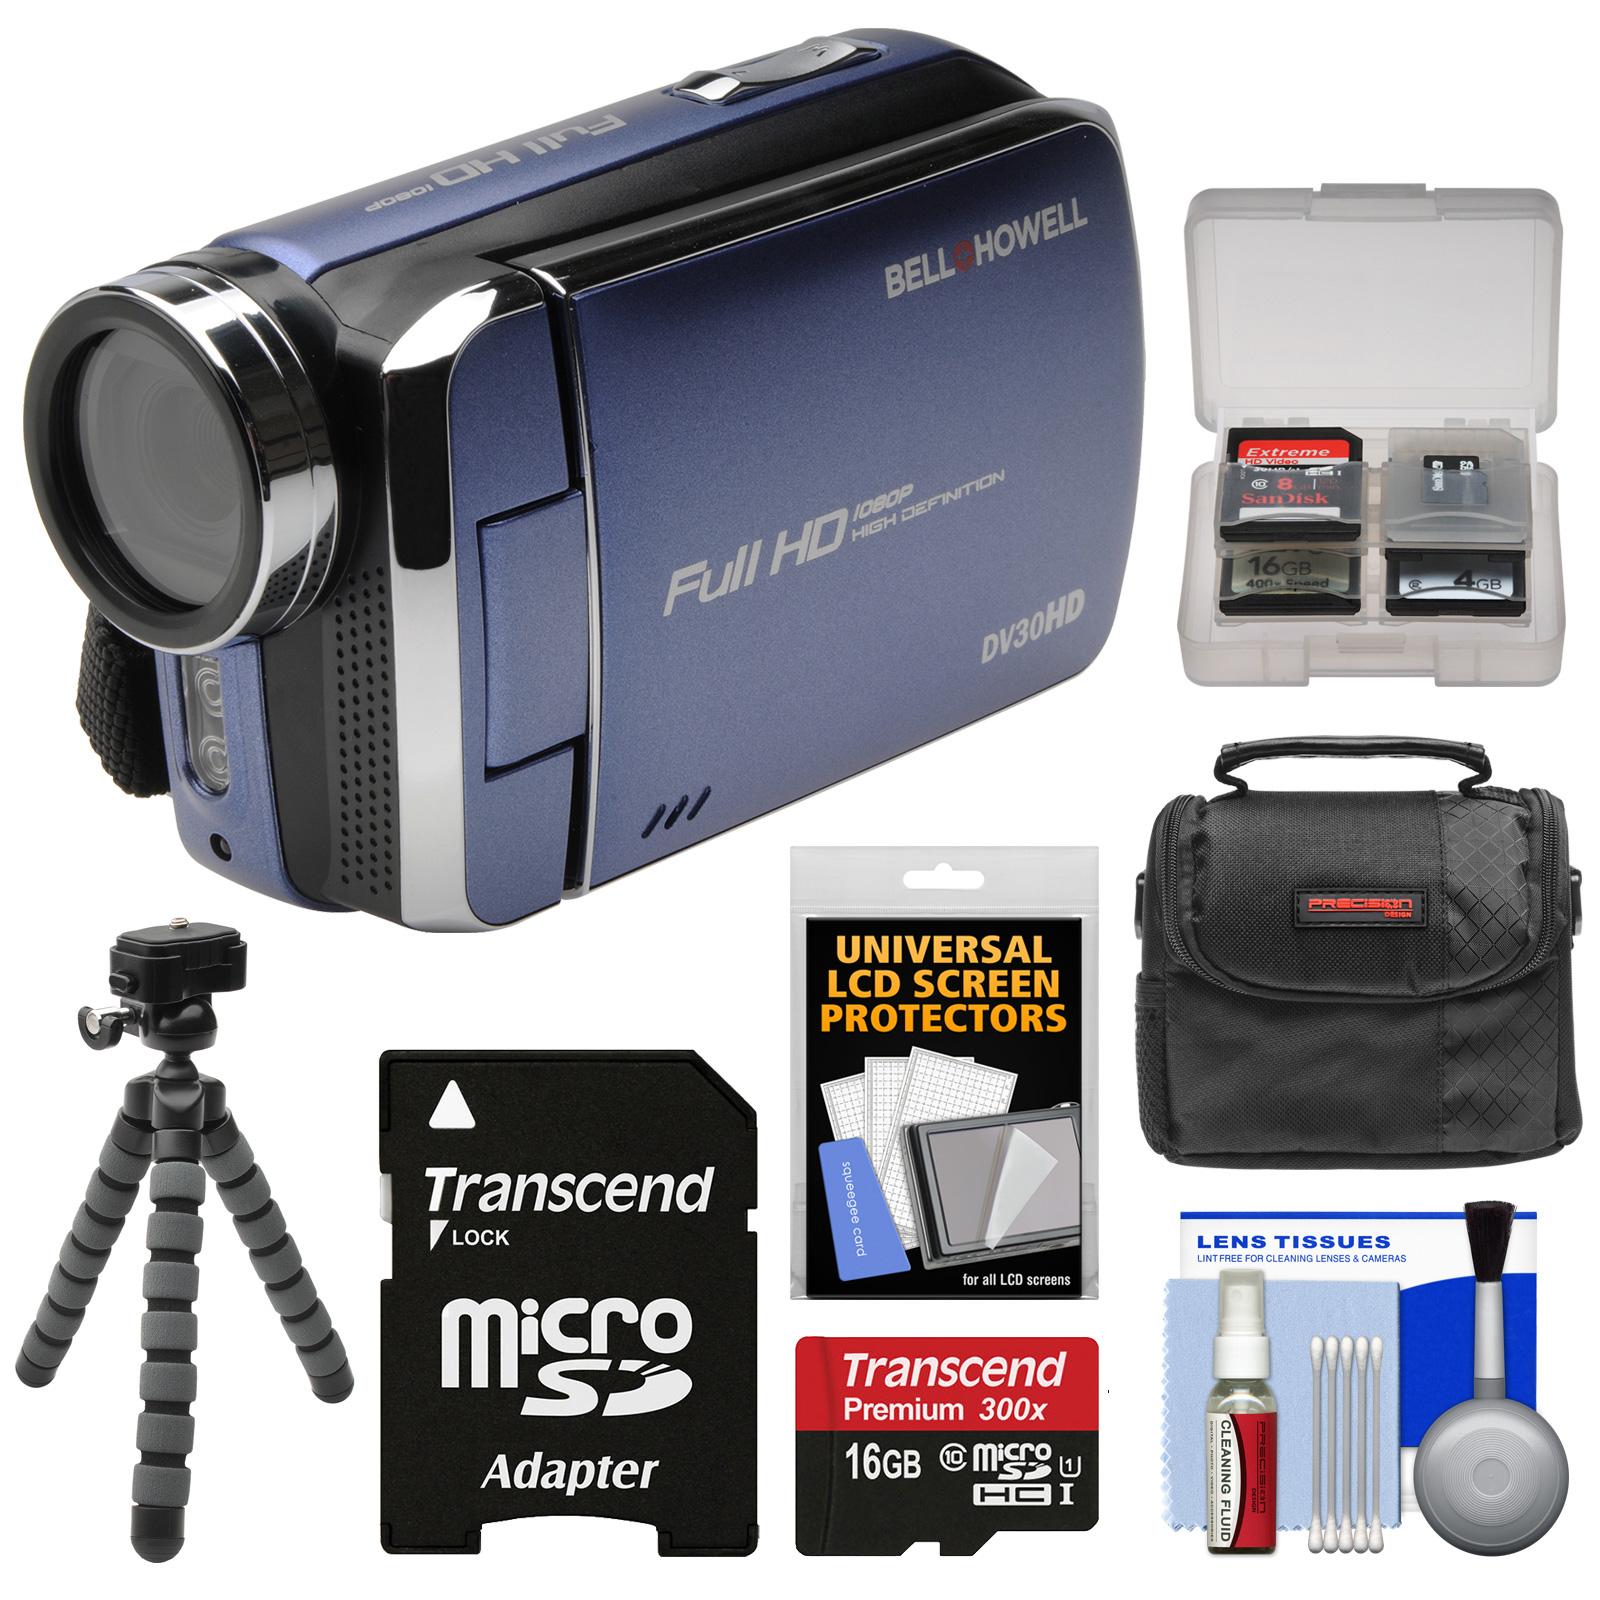 Bell & Howell DV30HD 1080p HD Digital Video Camera Camcorder (Blue) with 16GB Card + Case + Flex Tripod + Kit